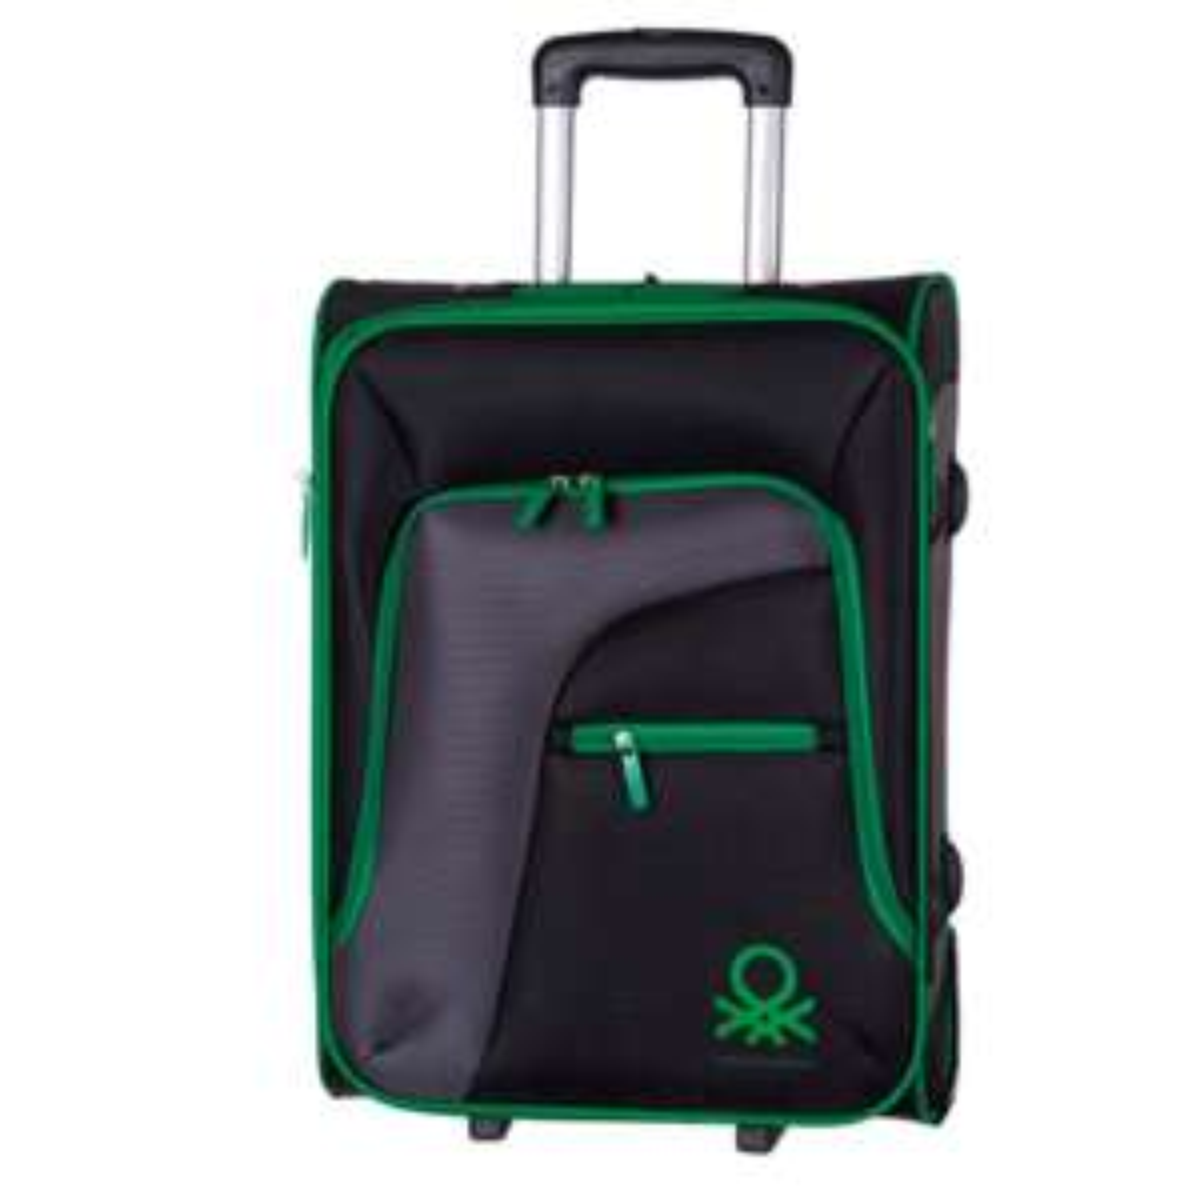 MeQuedoUno: Maleta Trolley Benetton Negra